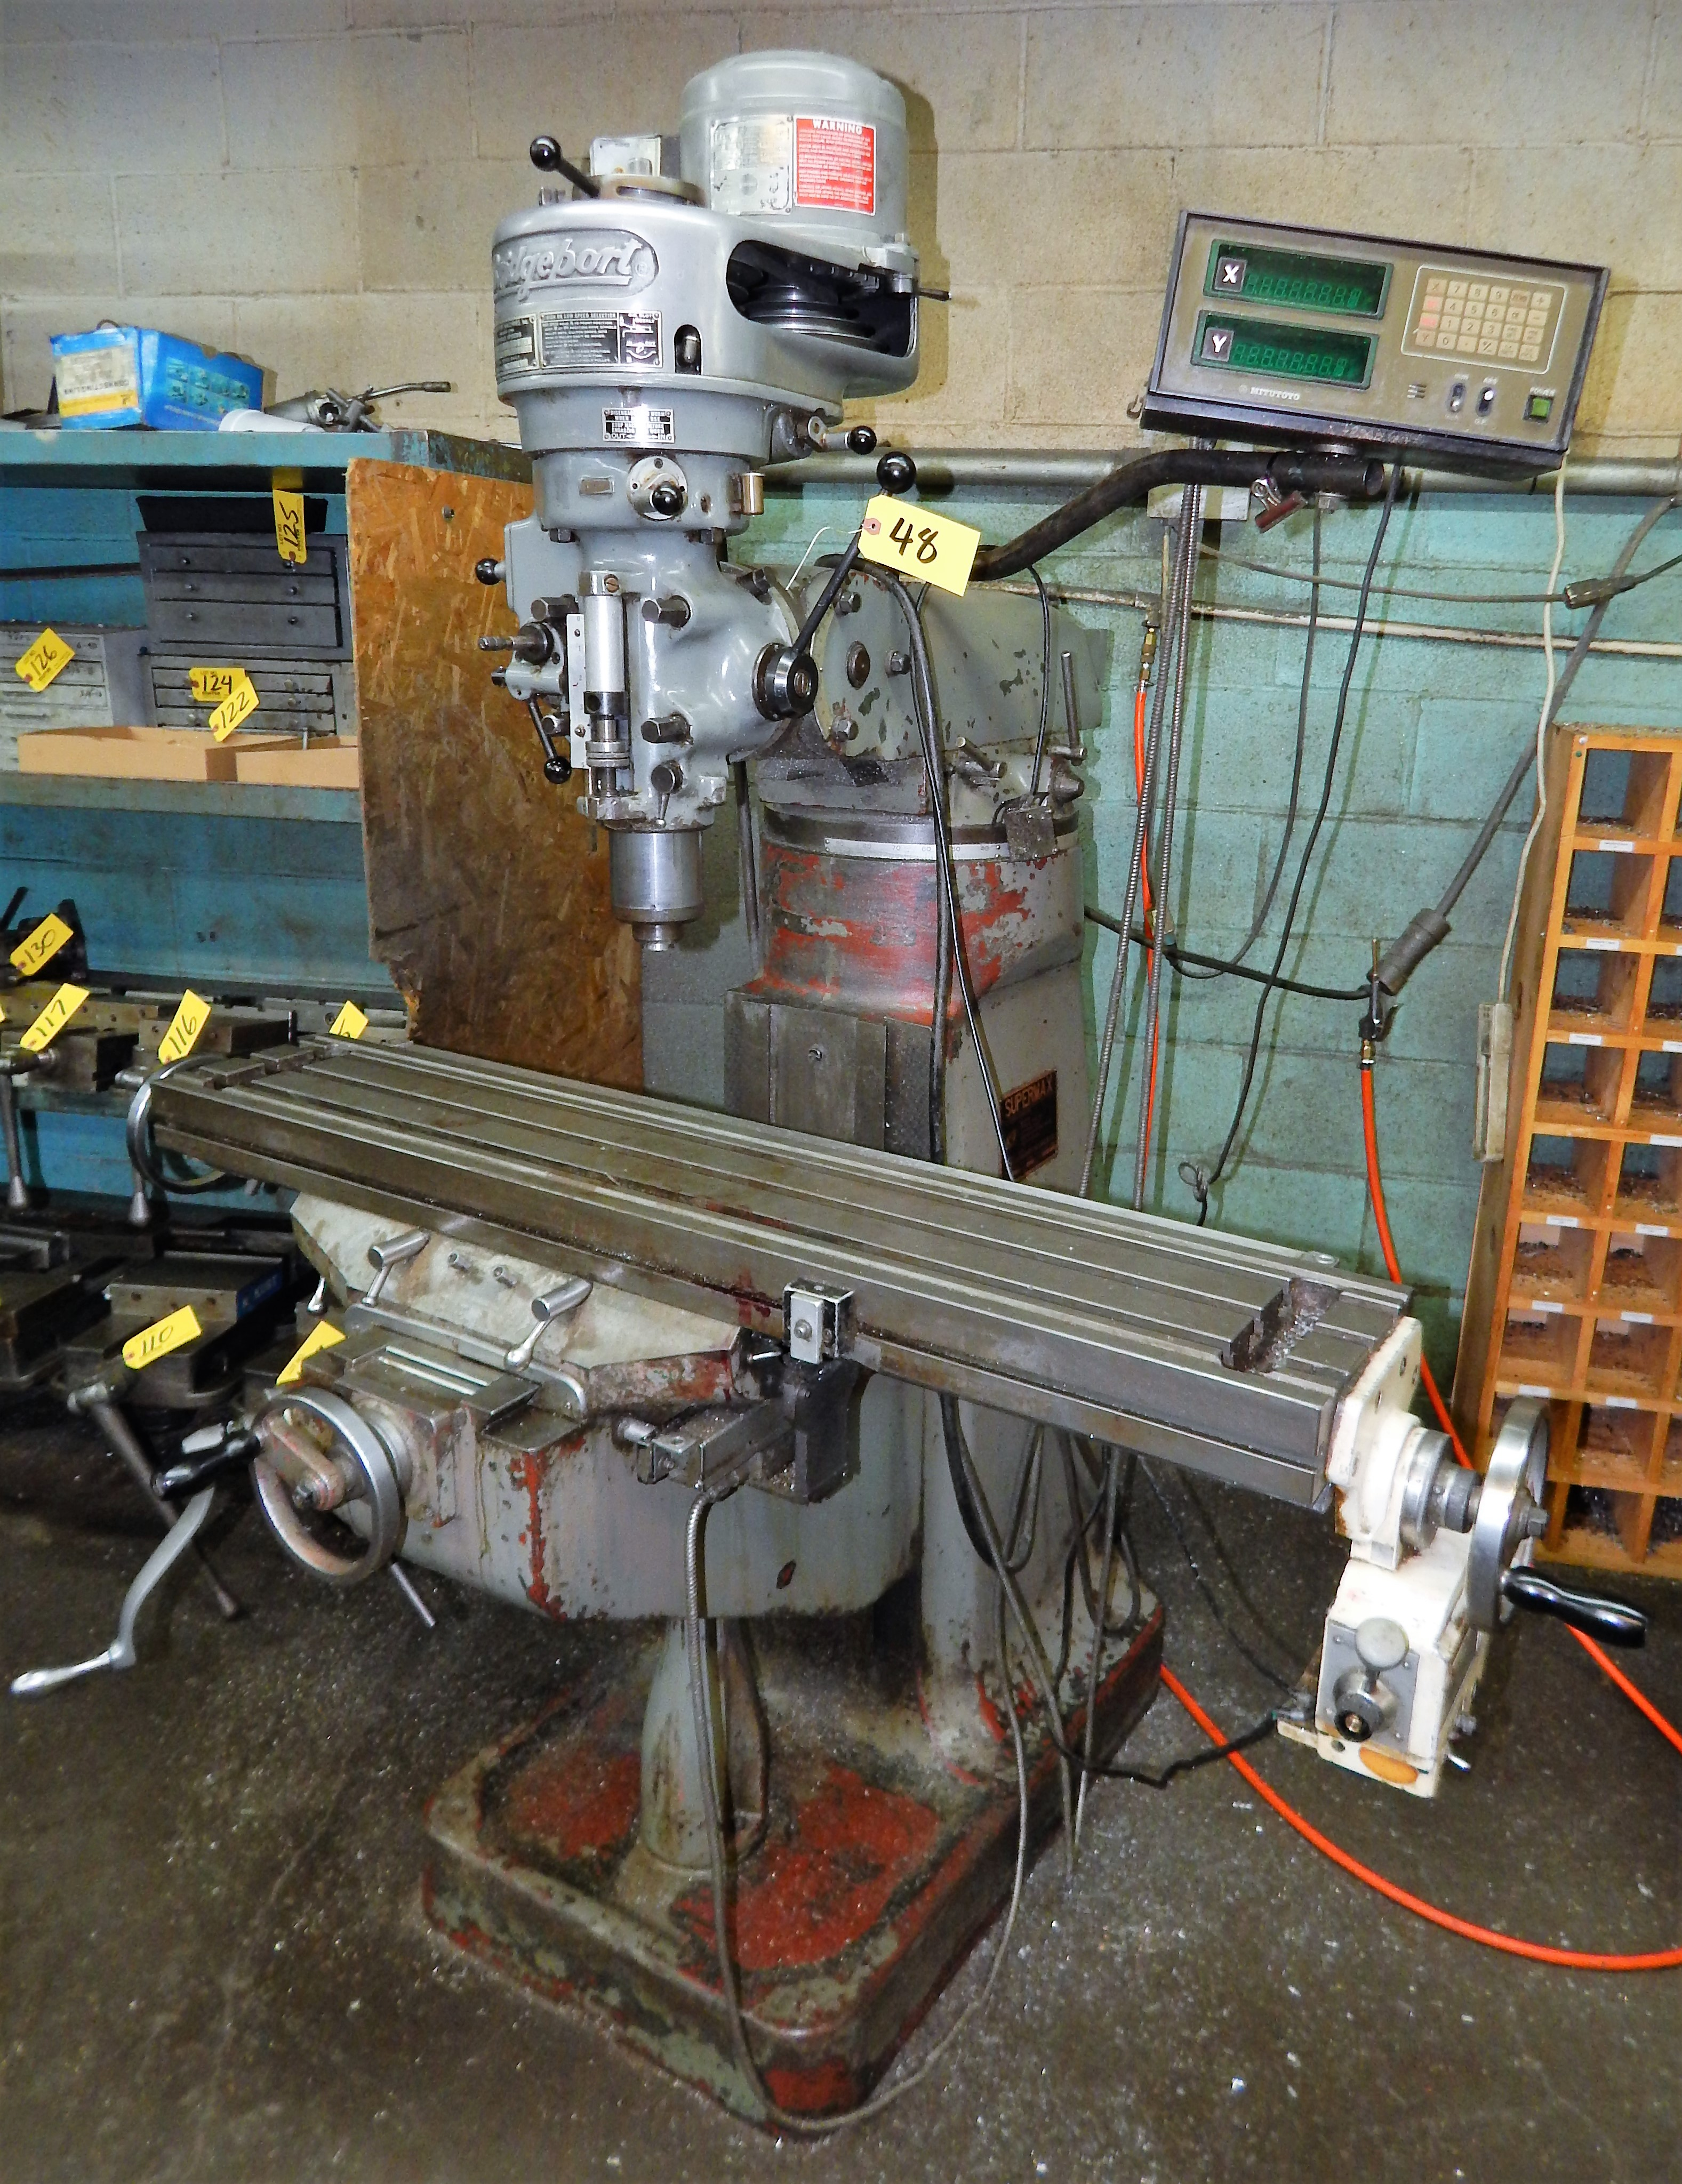 BRIDGEPORT/SUPERMAX VERTICAL MILLING MACHINE, 1HP, 80-2720 RPM